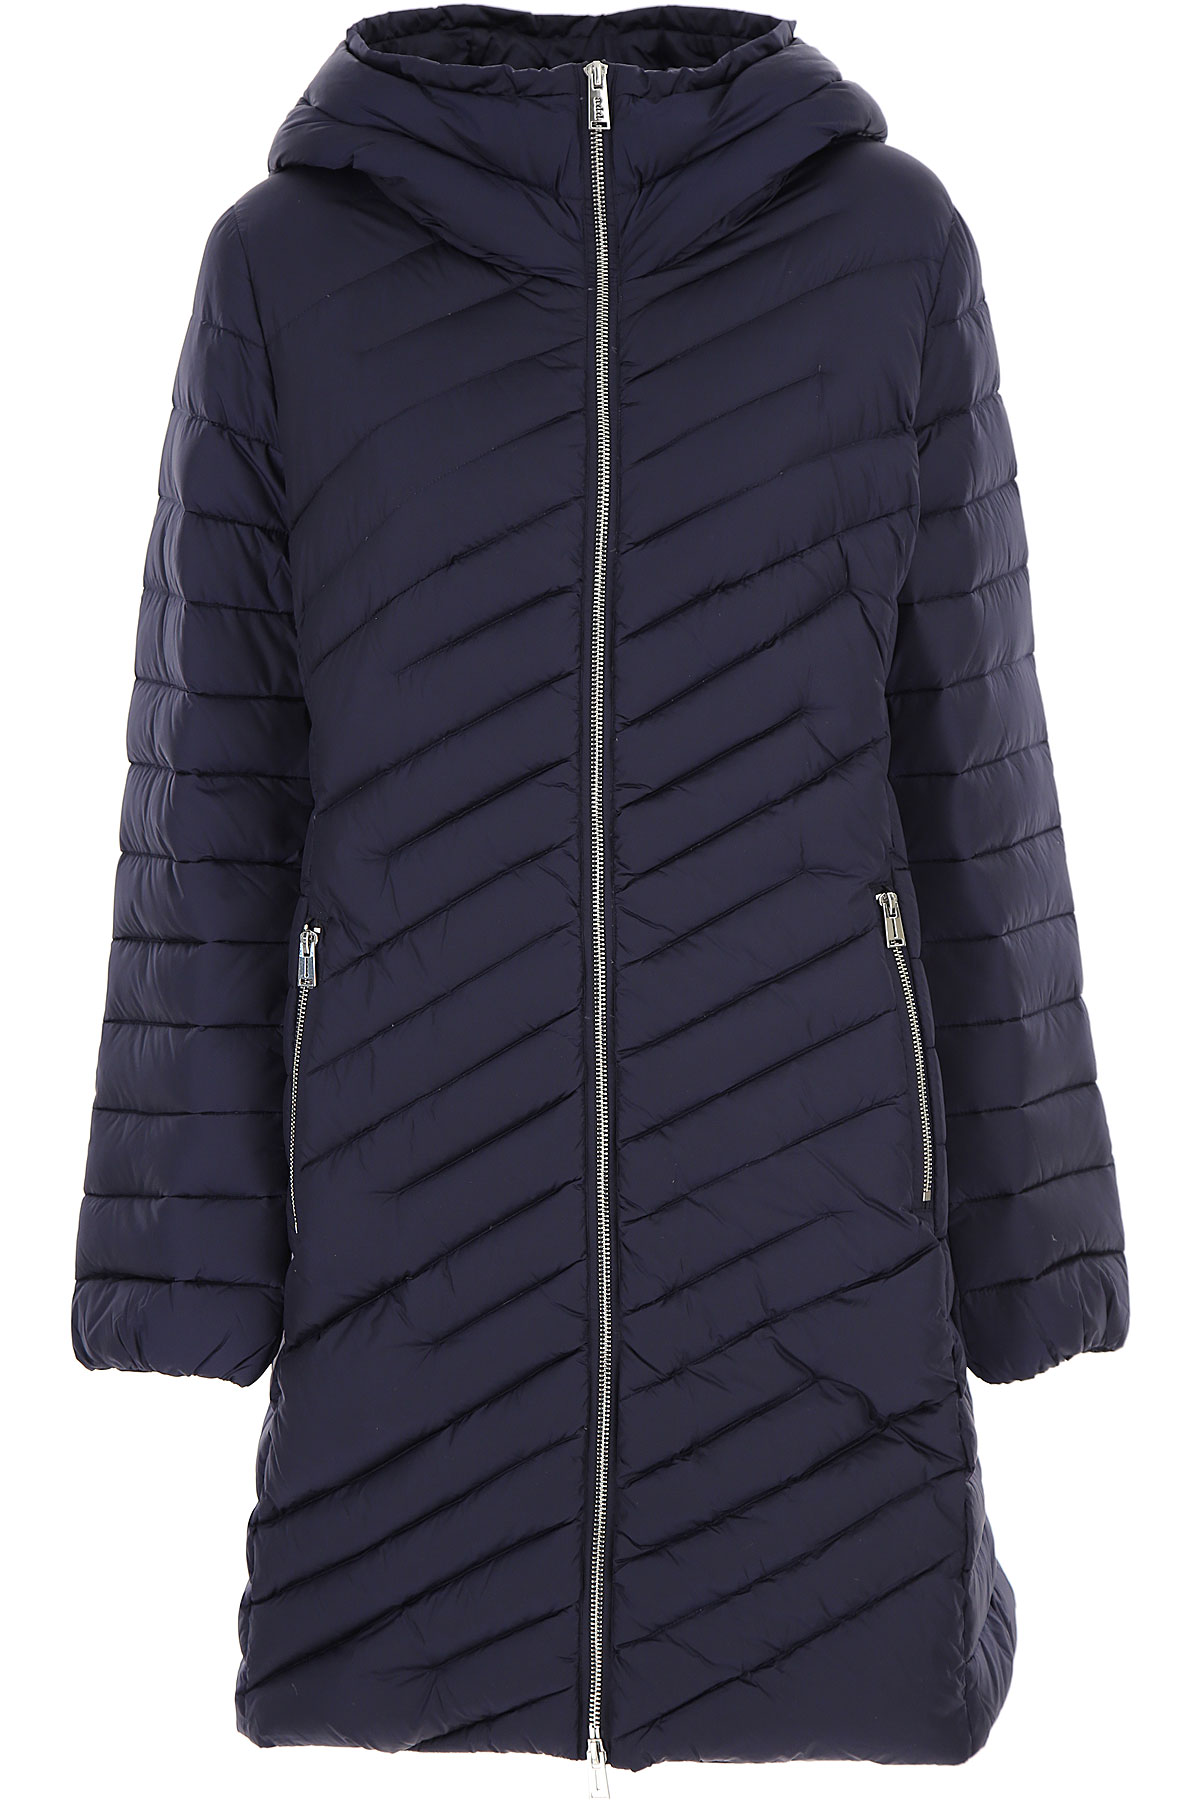 ADD Jacket for Women, Midnight Blue, polyamide, 2019, 10 12 6 8